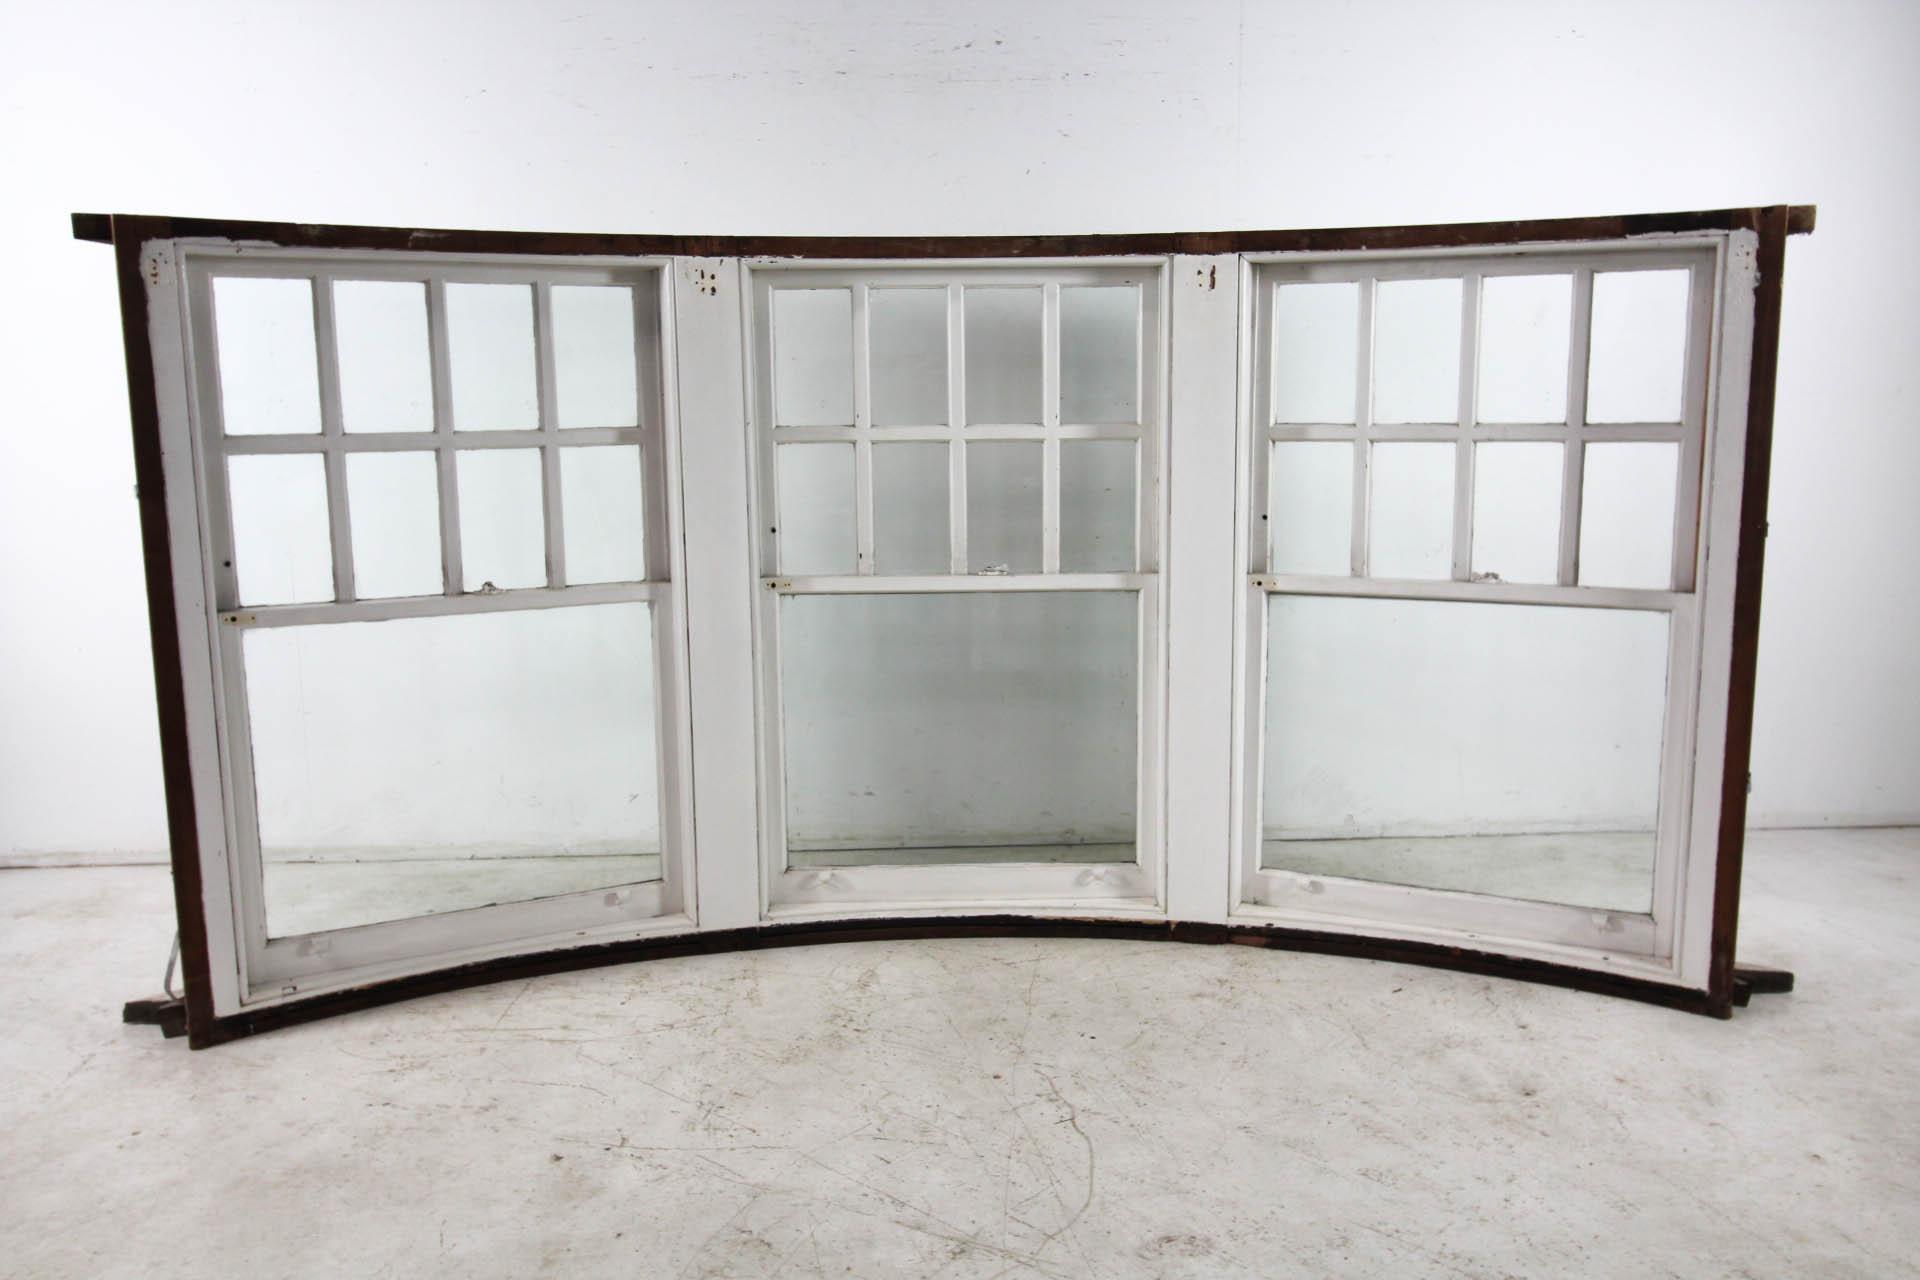 second hand windows Melbourne